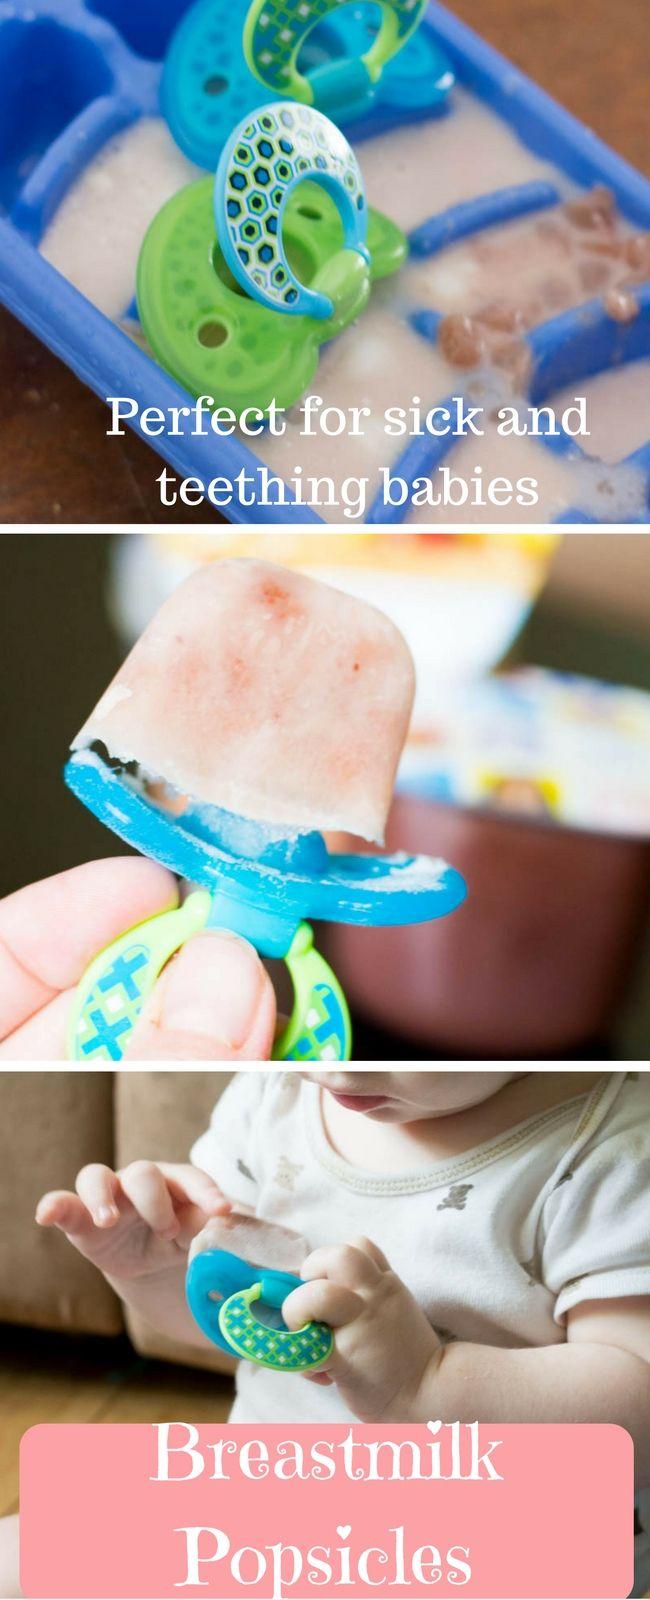 Breastmilk Popsicles For Sick And Teething Babies